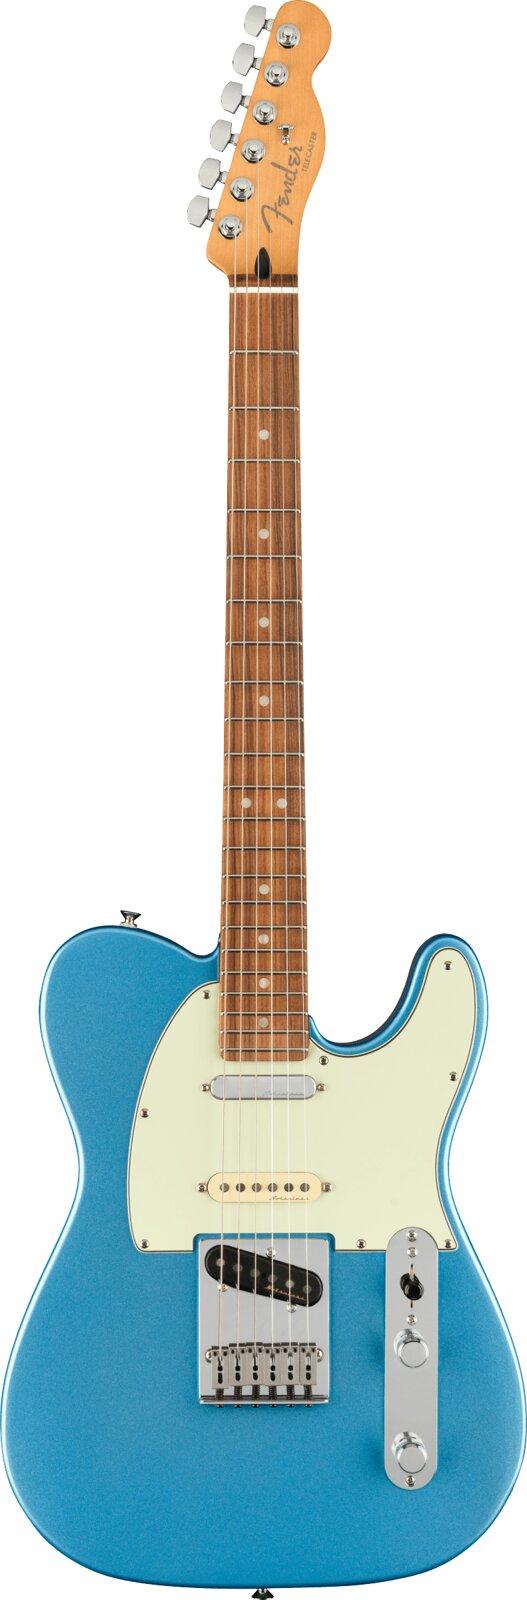 Fender Player Plus Nashville Telecaster, Pau Ferro Fingerboard, Opal Spark : photo 1